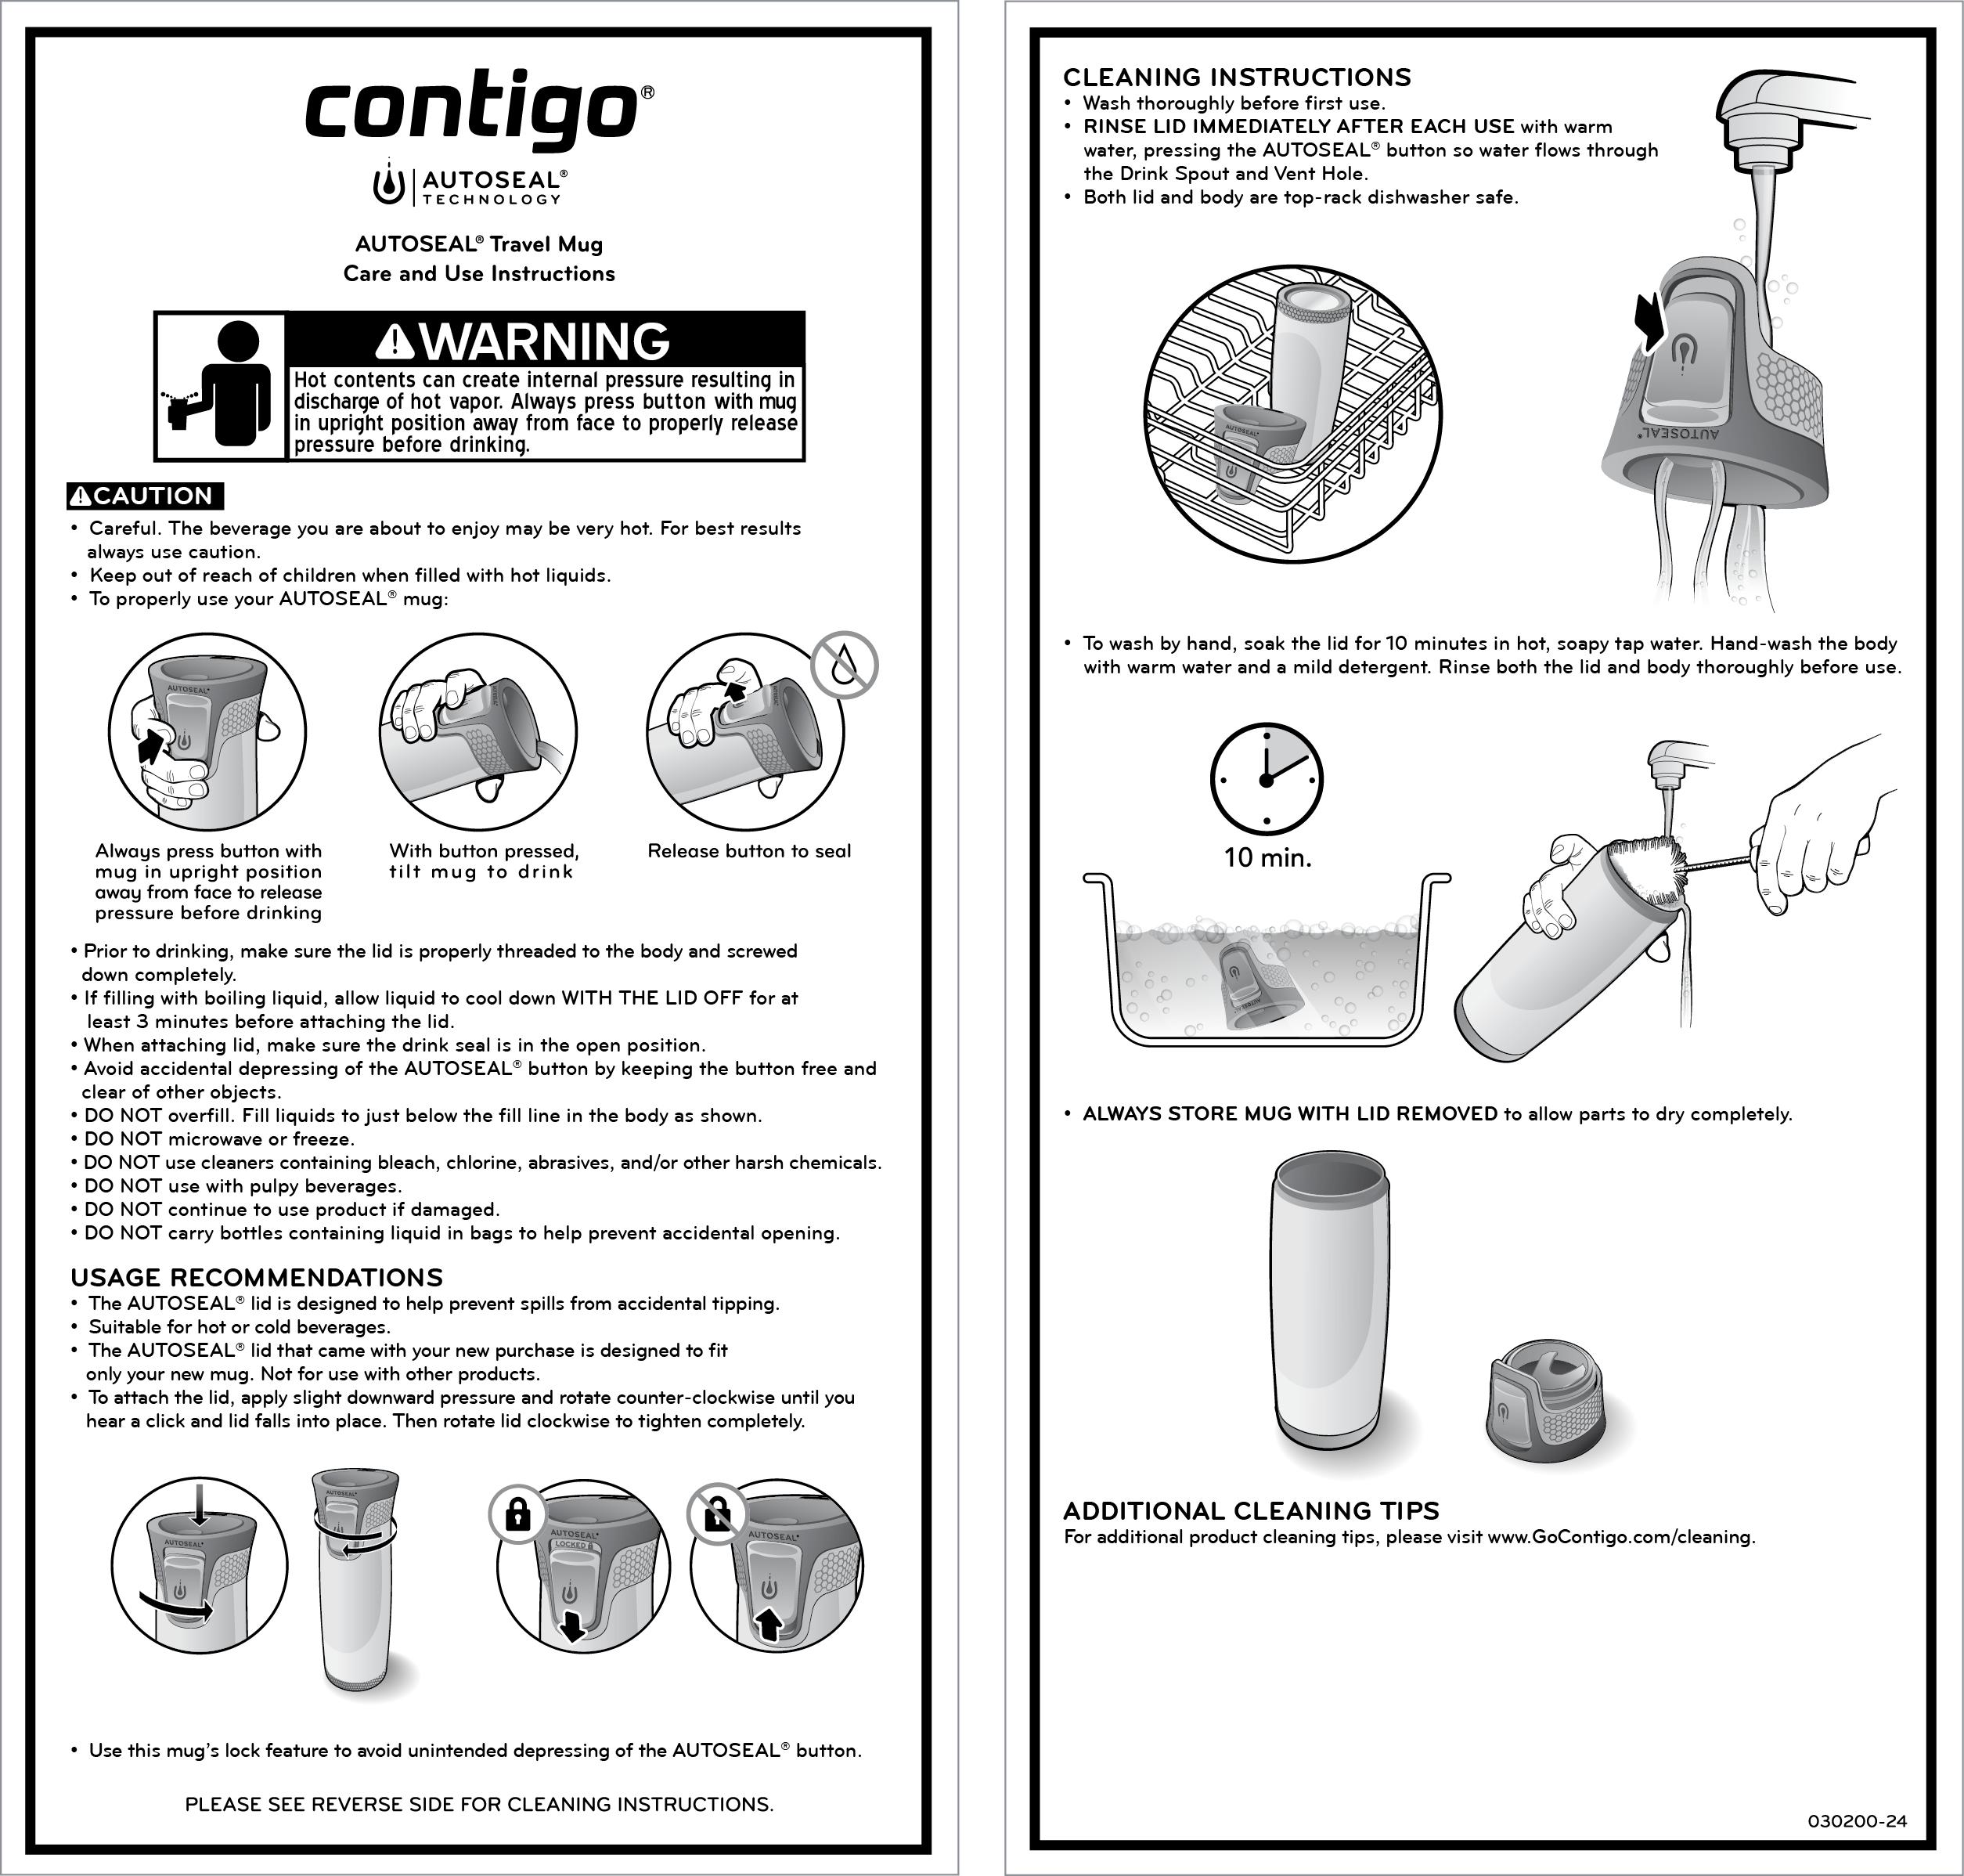 Stainless Steel Travel Mug, 16-Ounce: Vasos Contigo: Kitchen & Dining